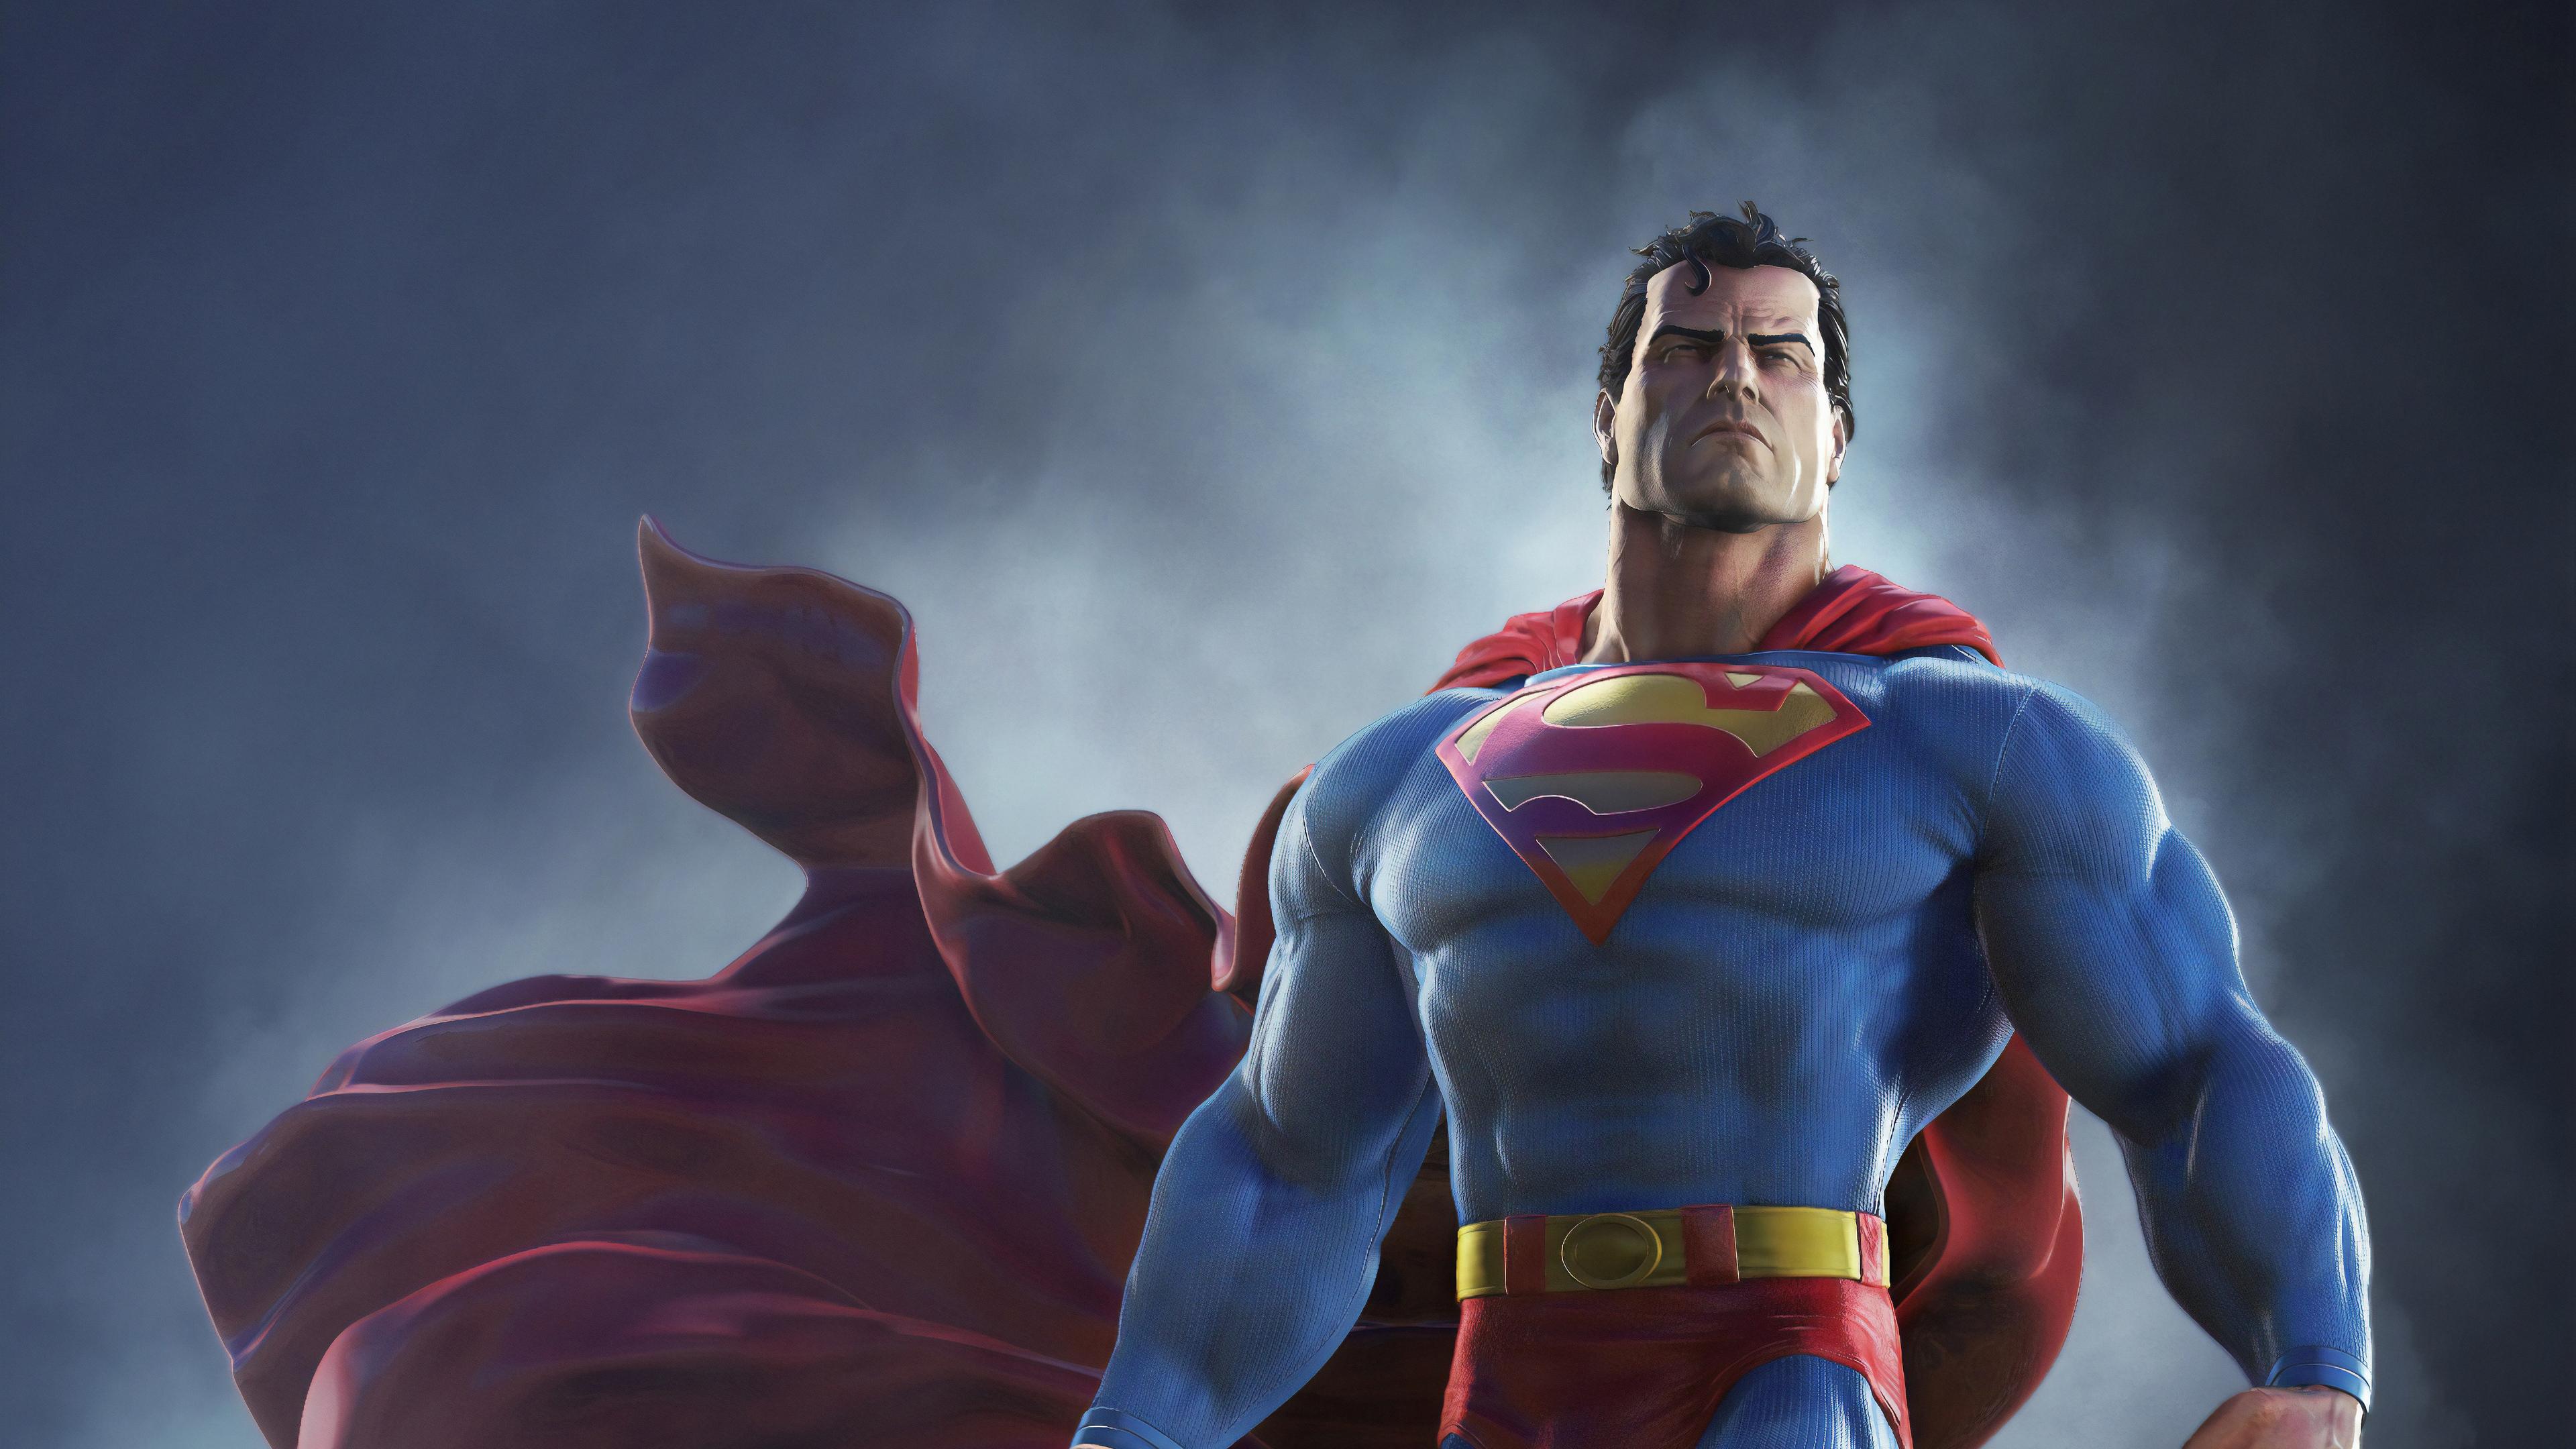 superman 1562105712 - Superman - superman wallpapers, superheroes wallpapers, hd-wallpapers, digital art wallpapers, artwork wallpapers, 4k-wallpapers